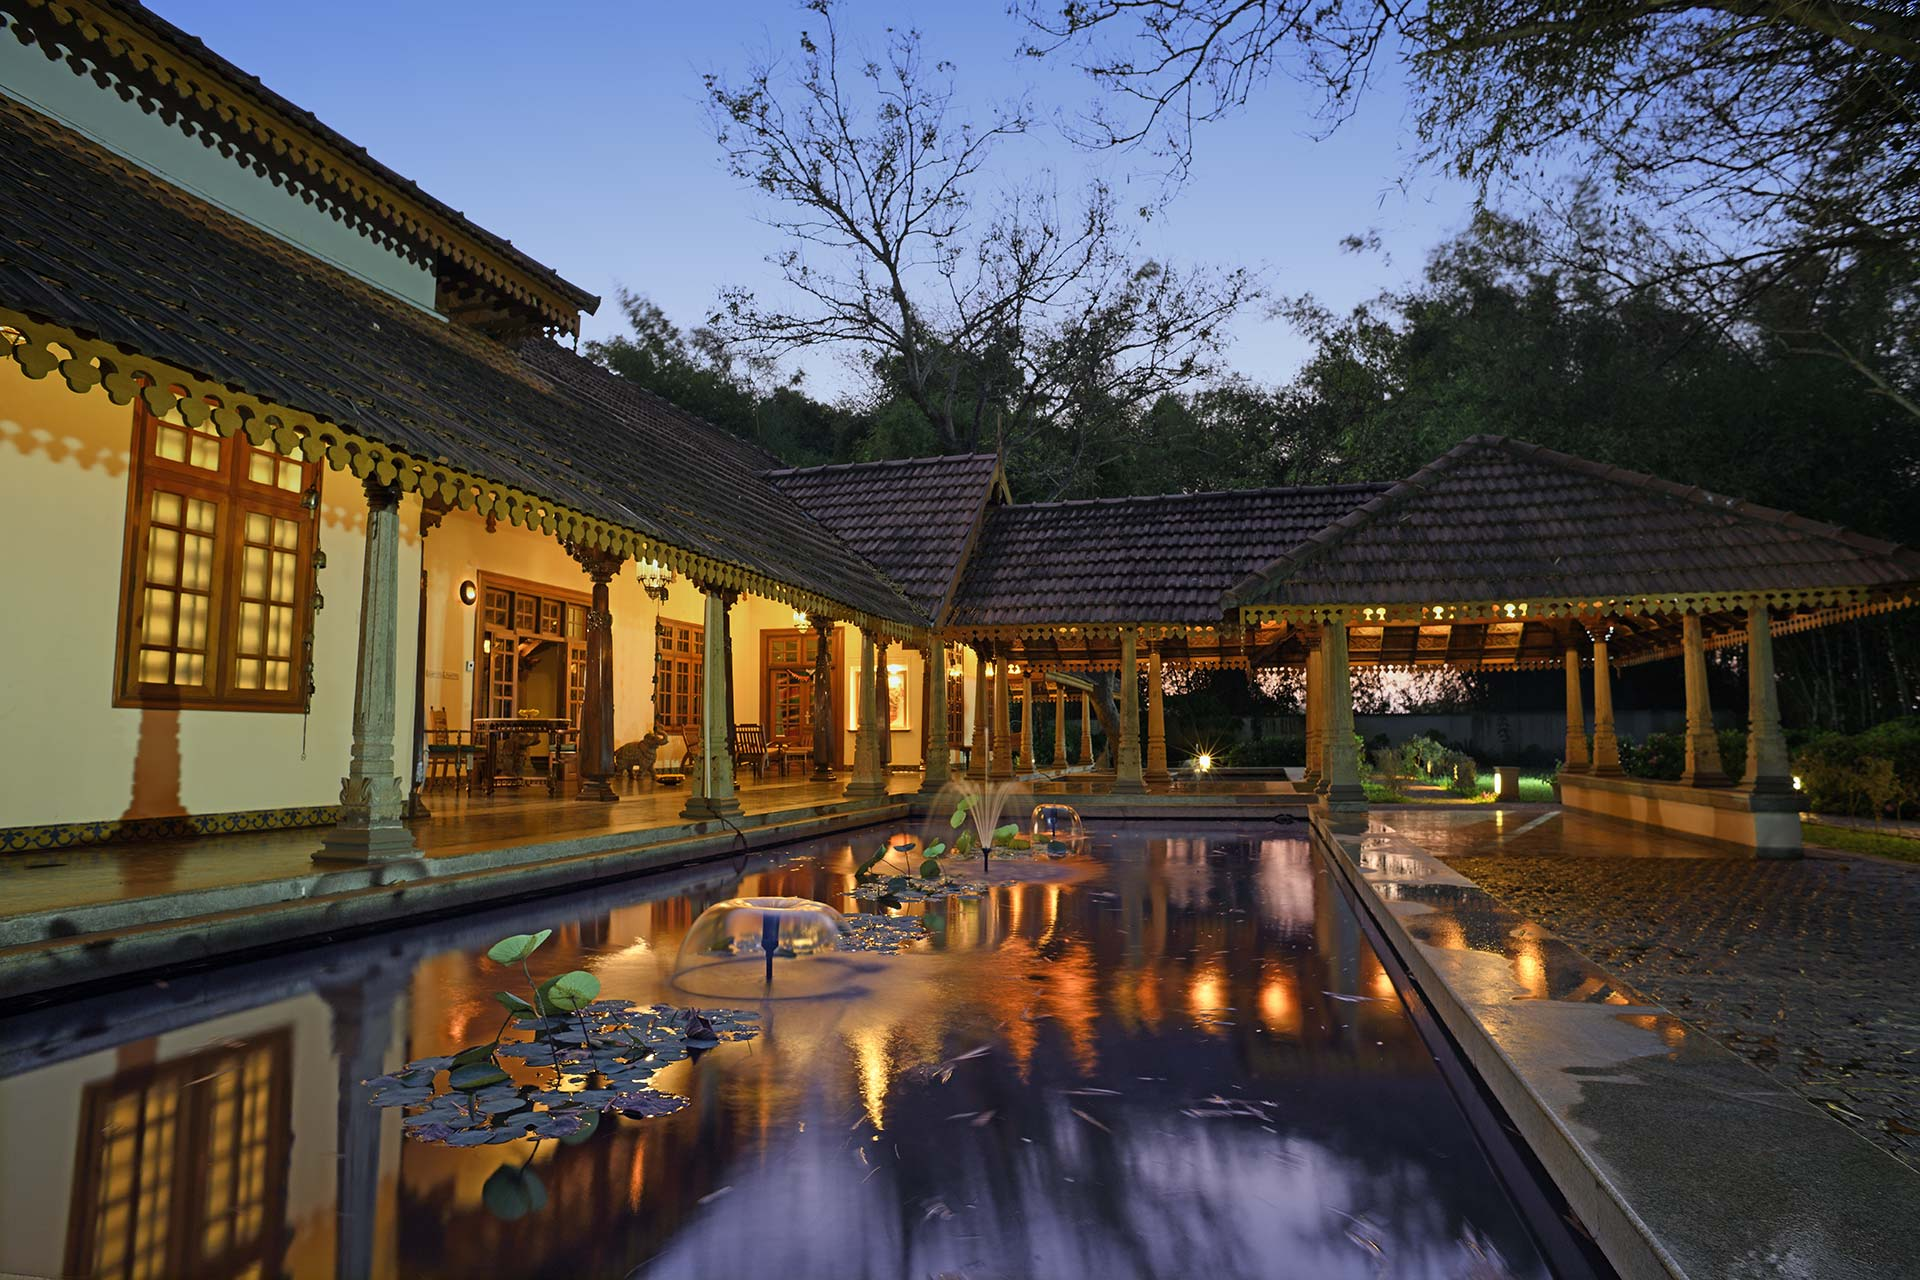 Svatma - Luxury Resorts Hotels in Tanjavur, Tamil Nadu (India)